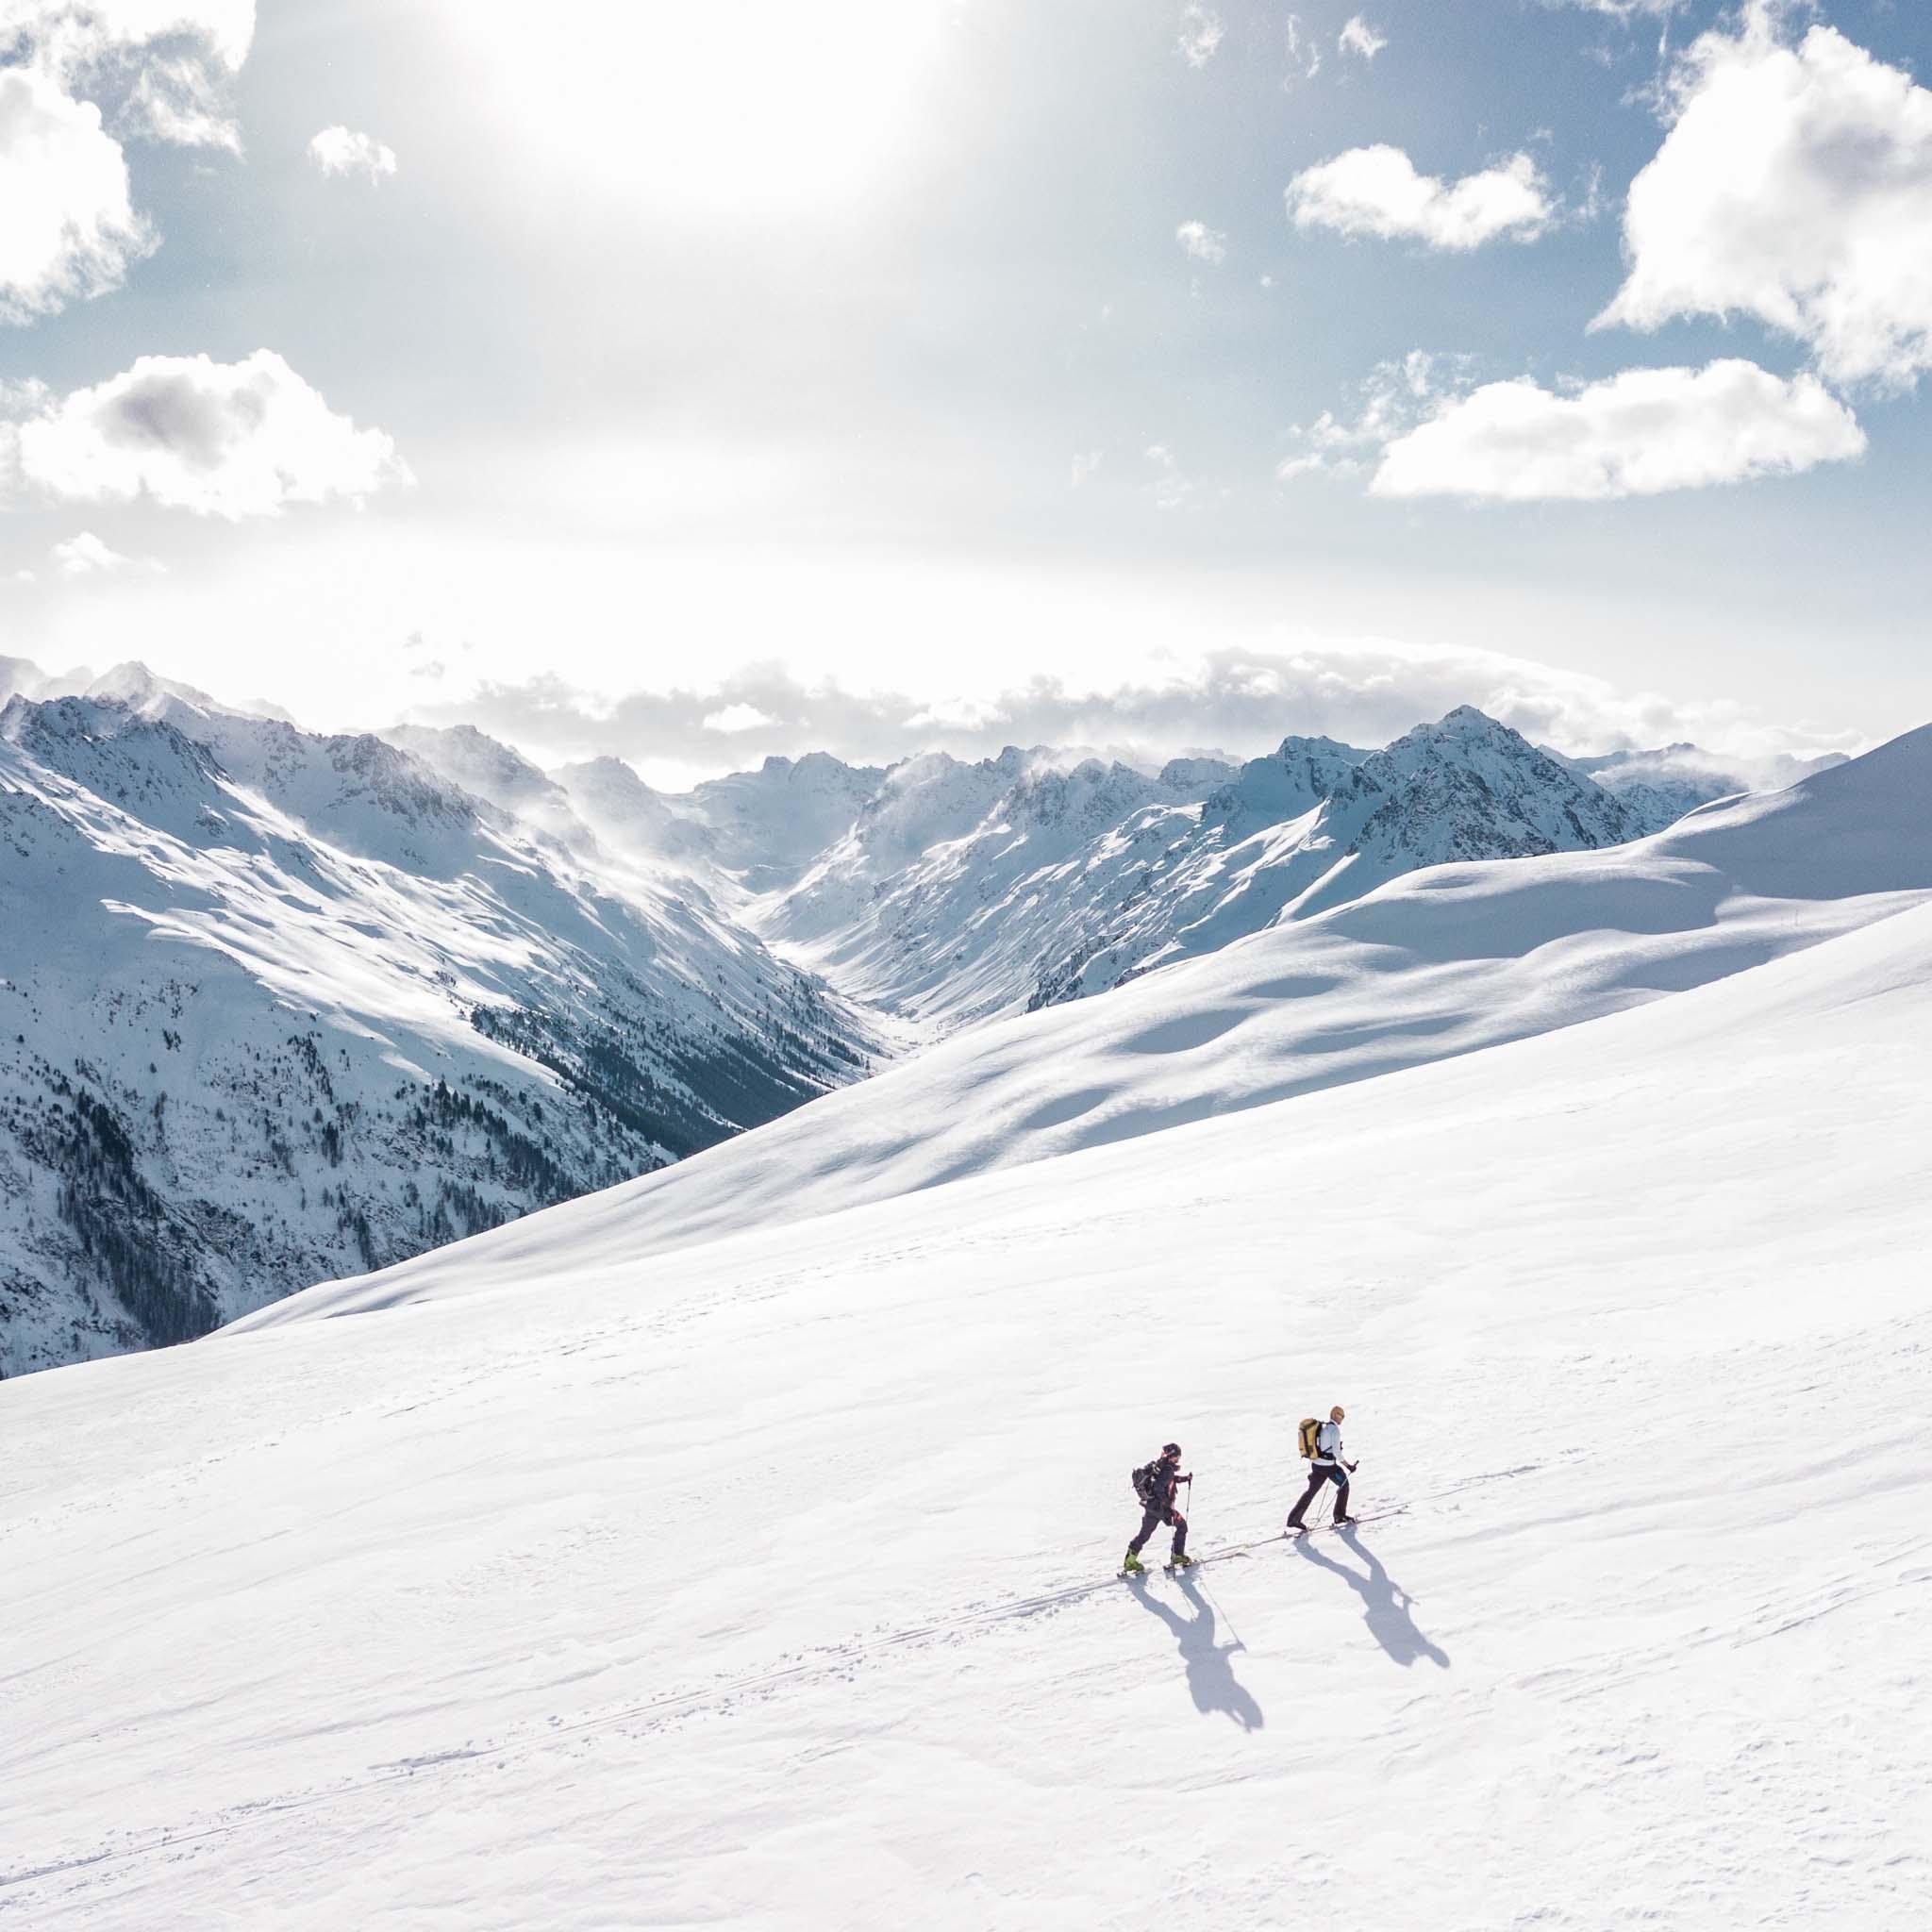 Vacances Ski Snowboard Glisse Voyage Montagne Sports d'hiver Odysight Travel Experts